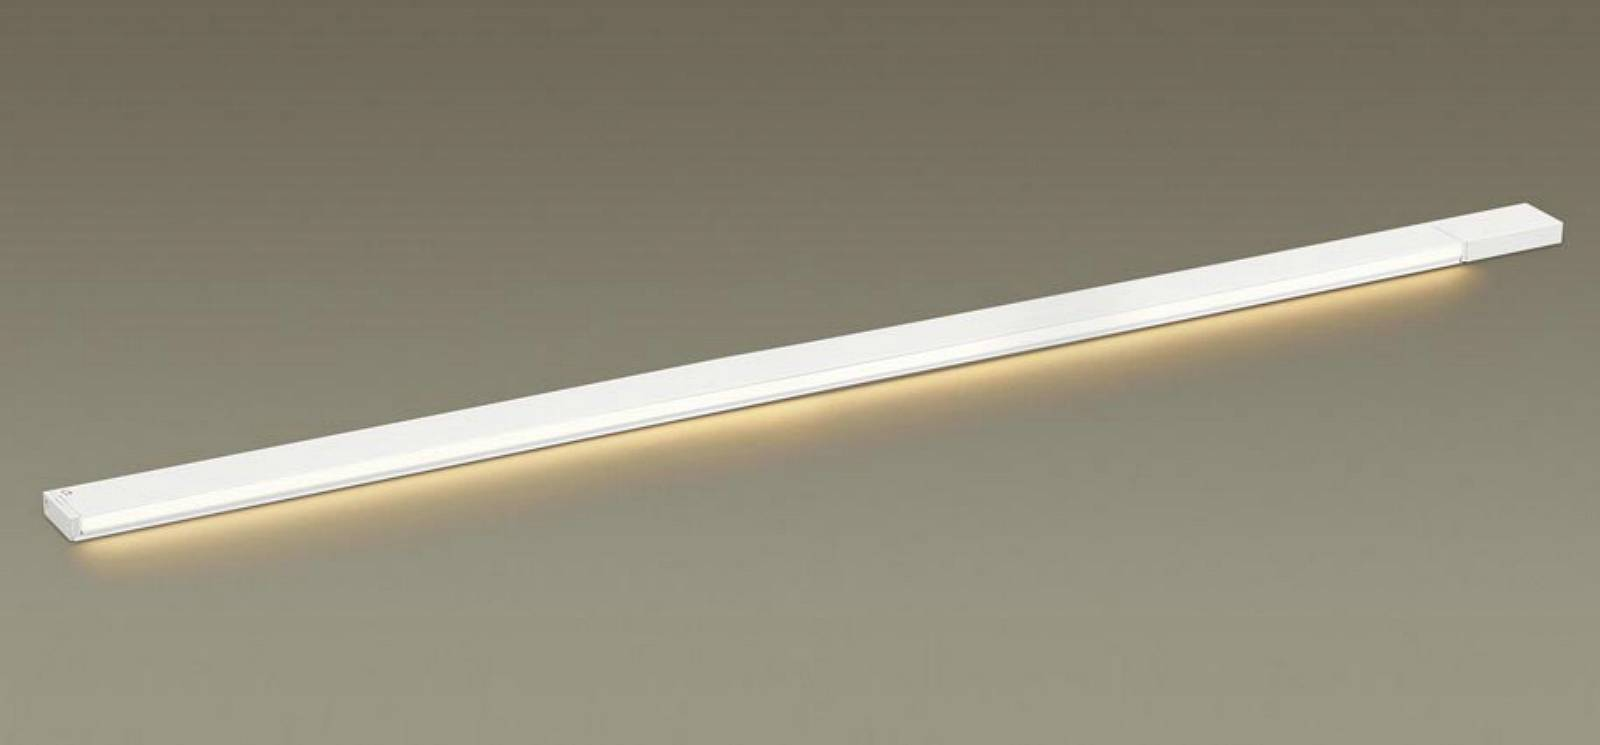 T区分 パナソニック LGB51935LE1 ベースライト 建築化照明器具 畳数設定無し LED【setsuden_led】